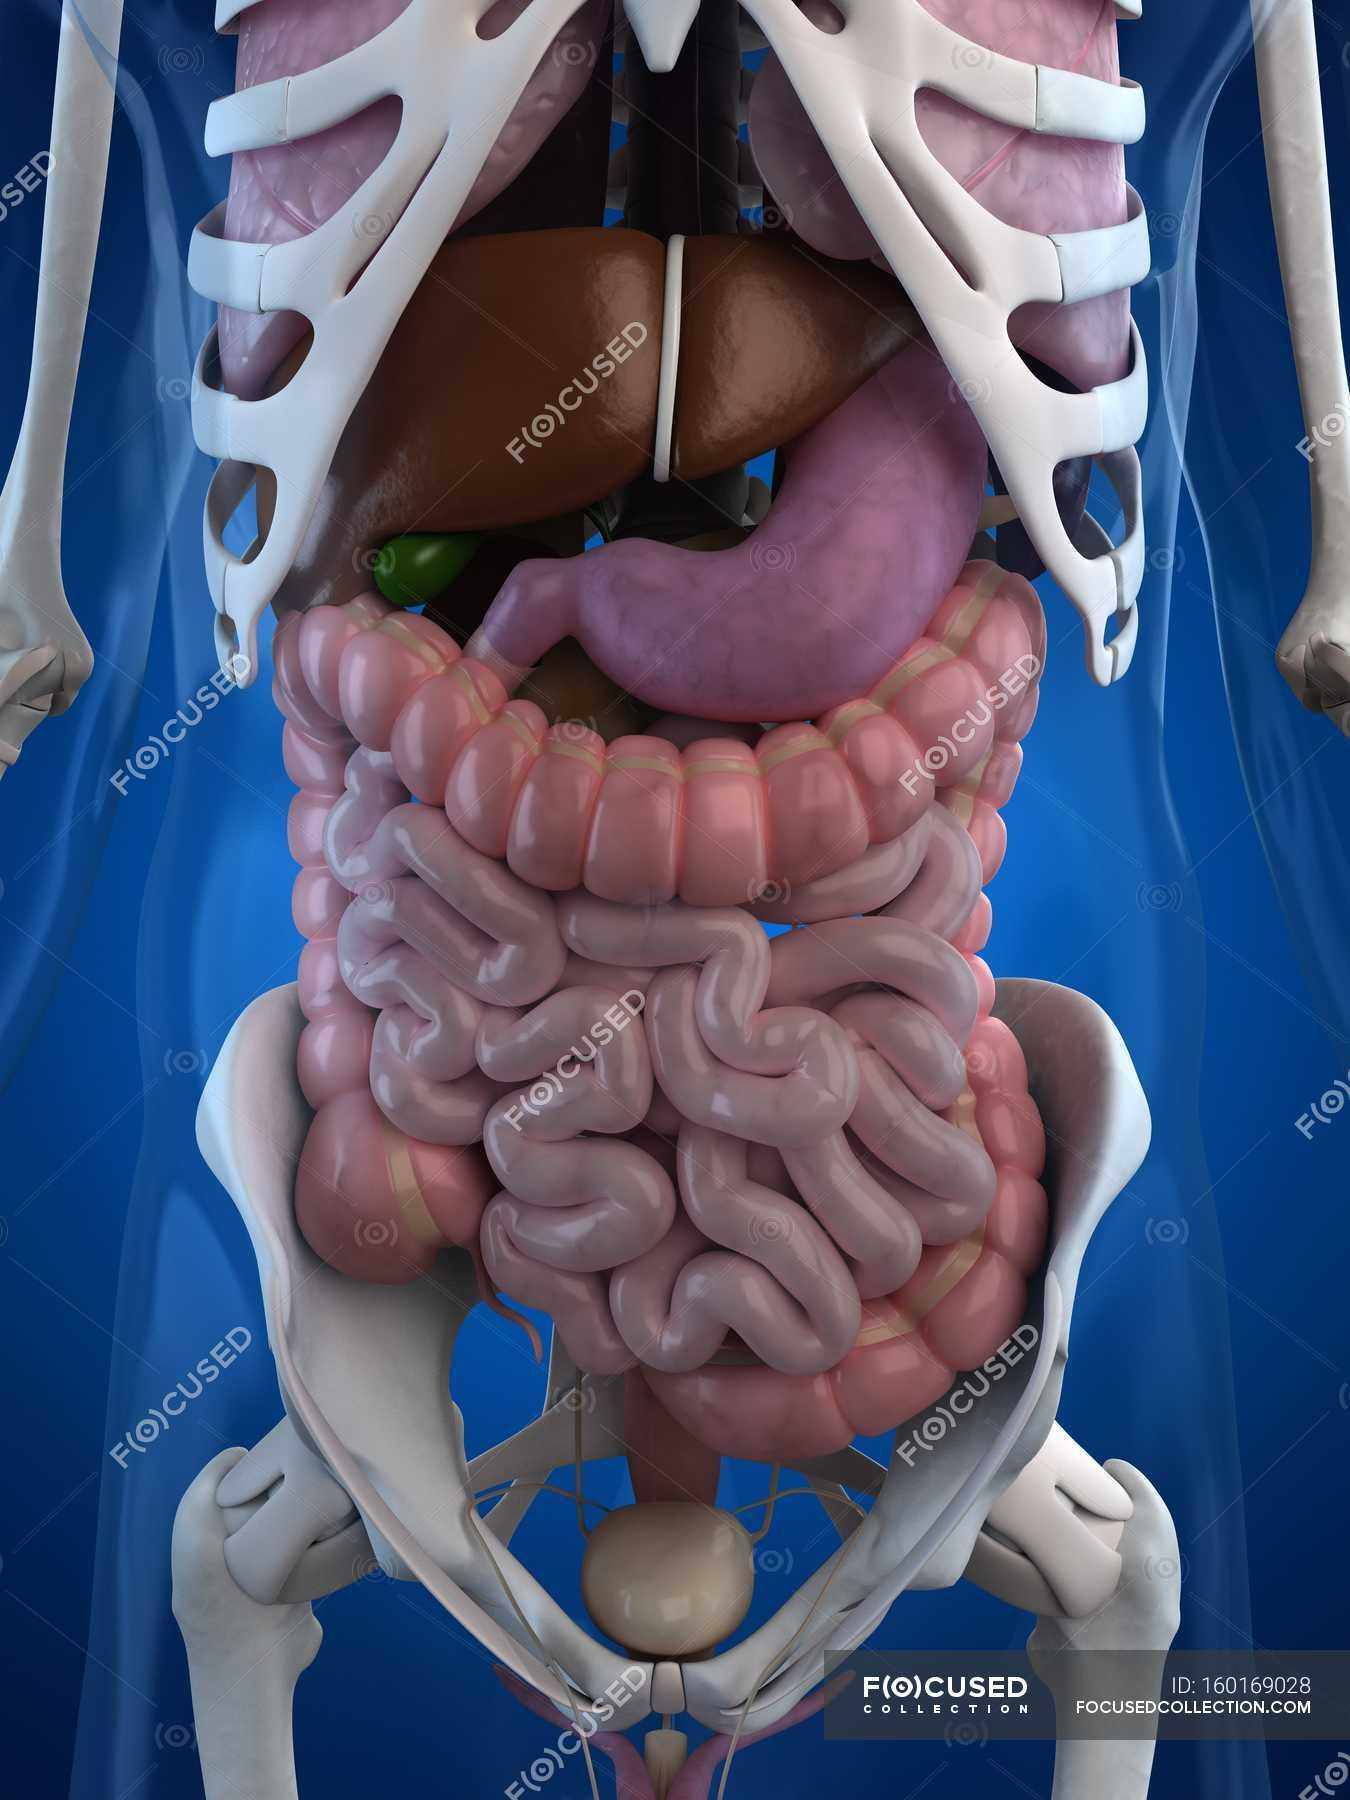 Human gastrointestinal tract anatomy — Stock Photo | #160169028